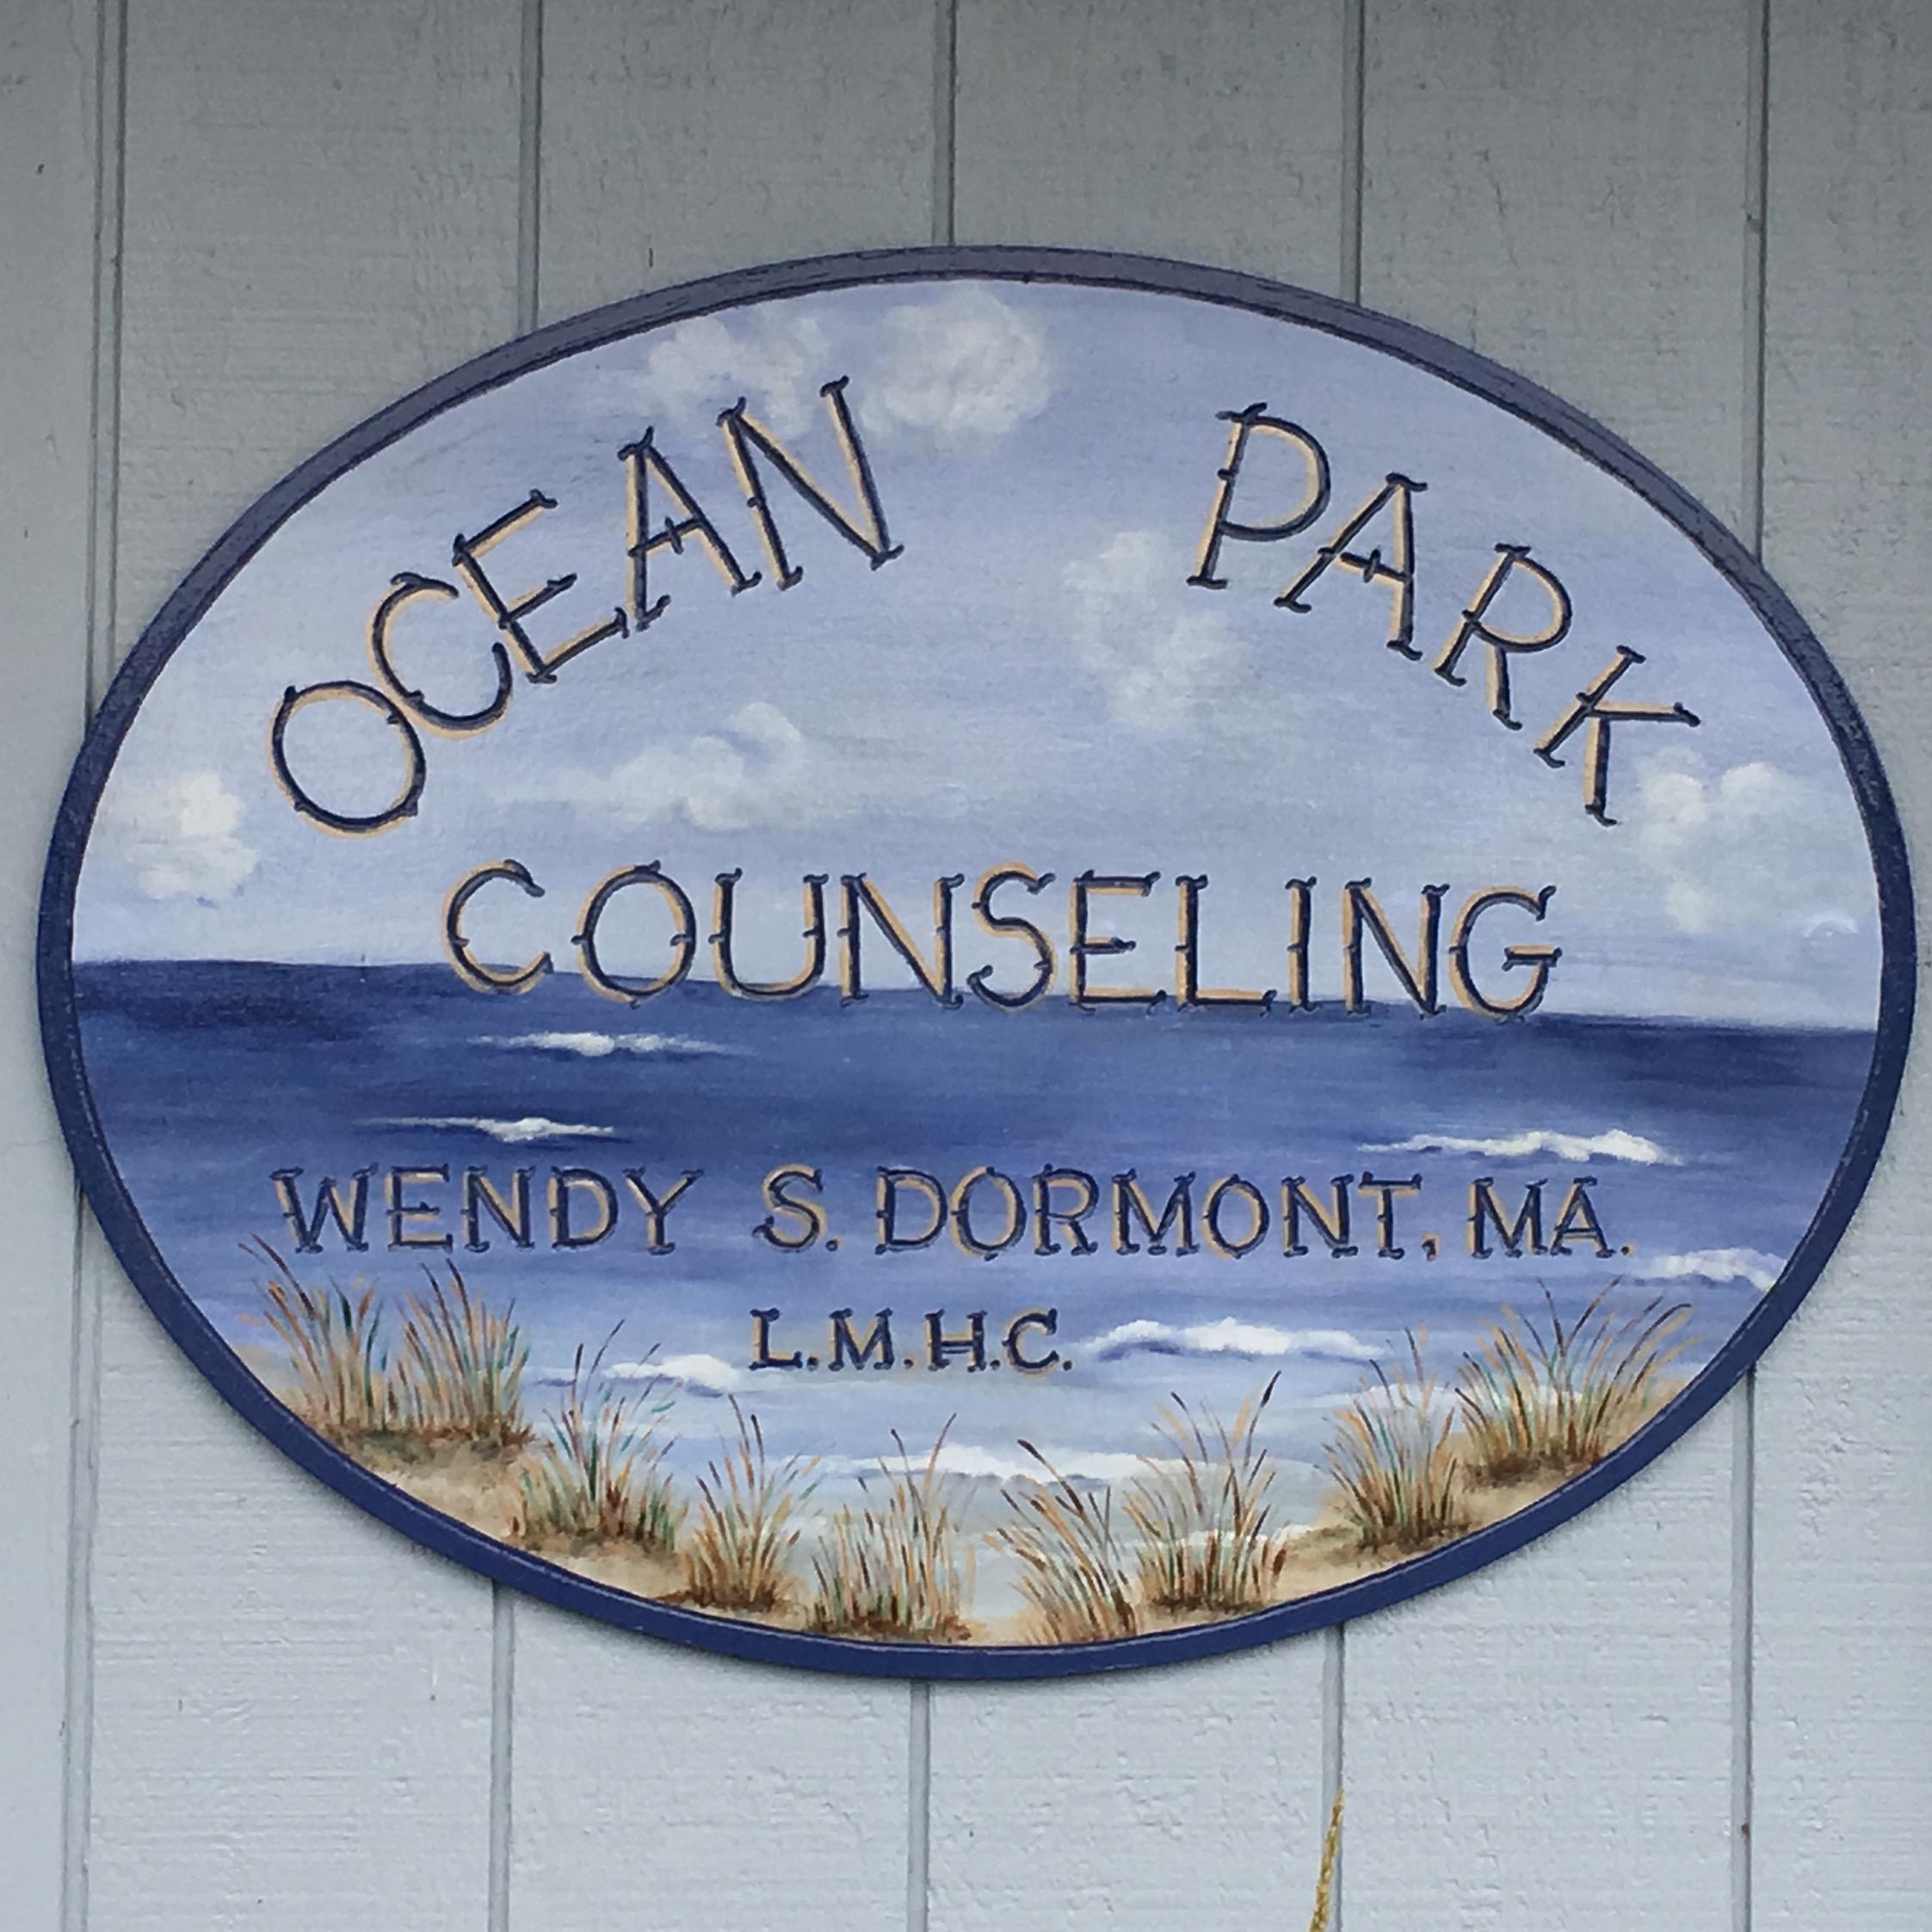 Ocean Park Counseling